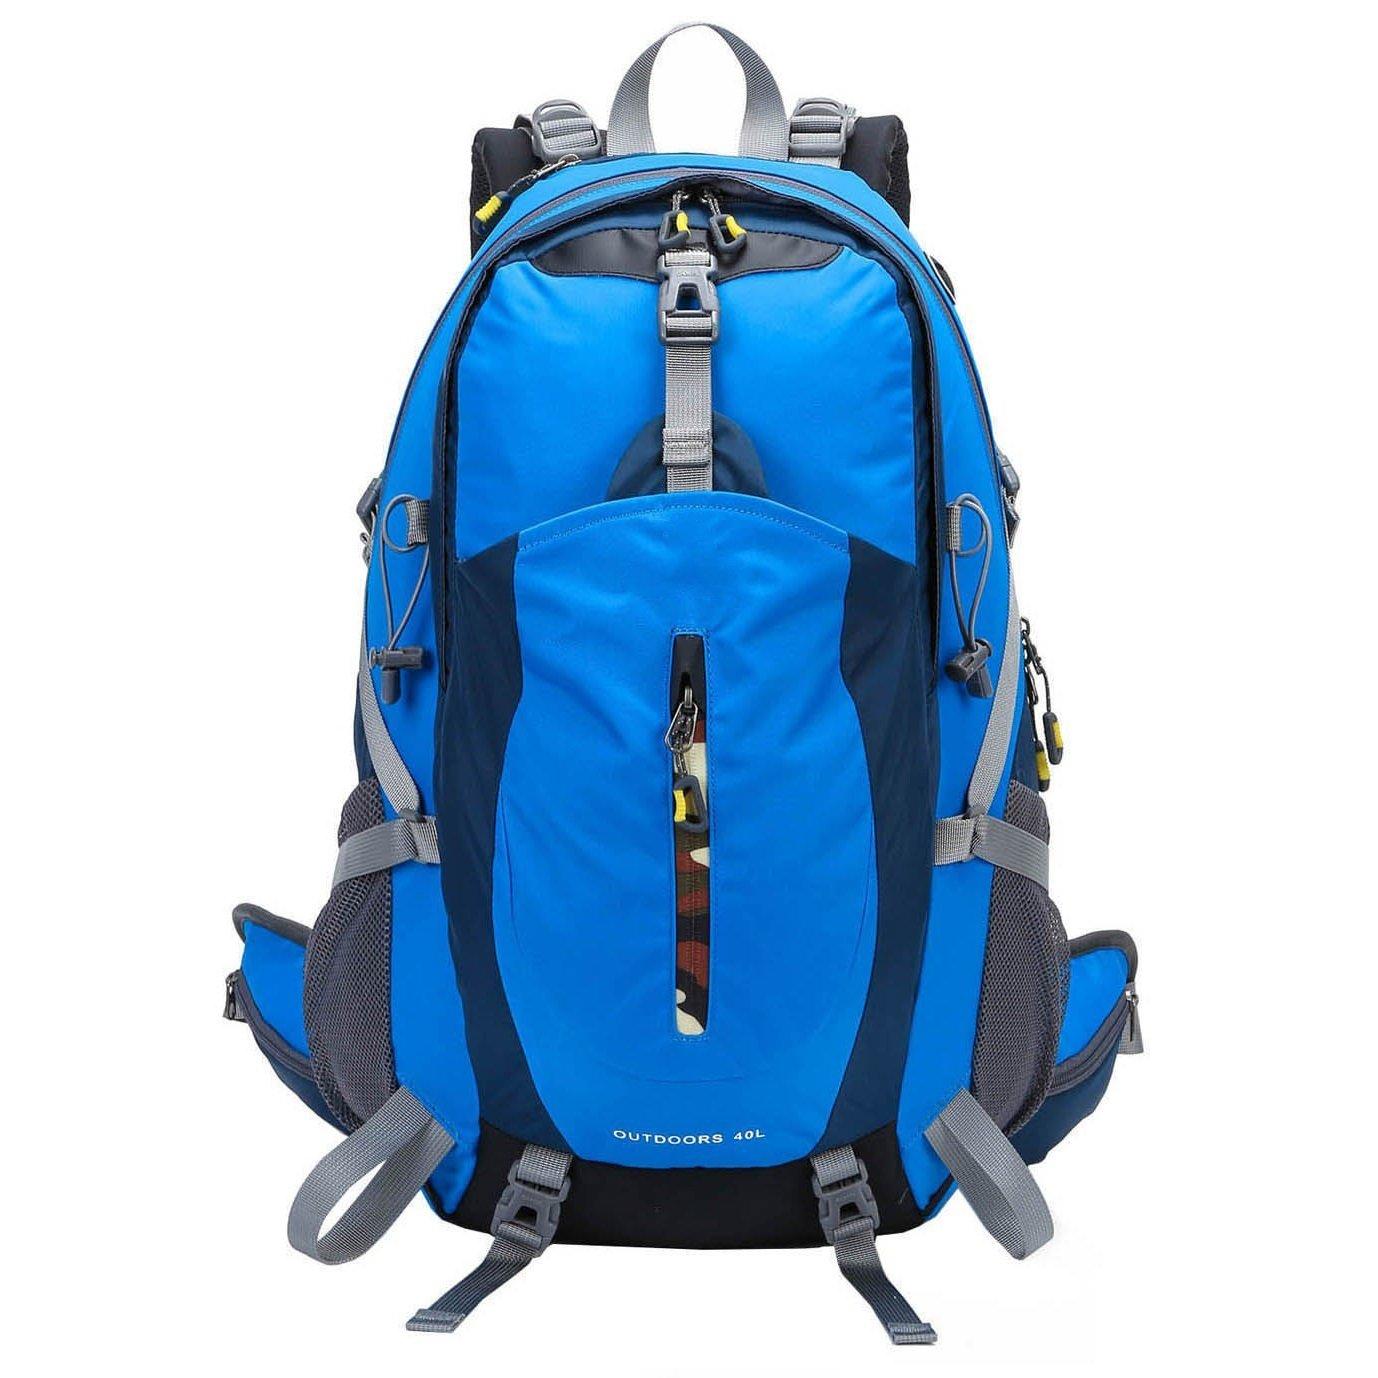 ZOUQILAI Outdoor Climbing Backpack Men And Women Sports Travel Backpack Hiking Camping Cycling Climbing Travel Bag 40L